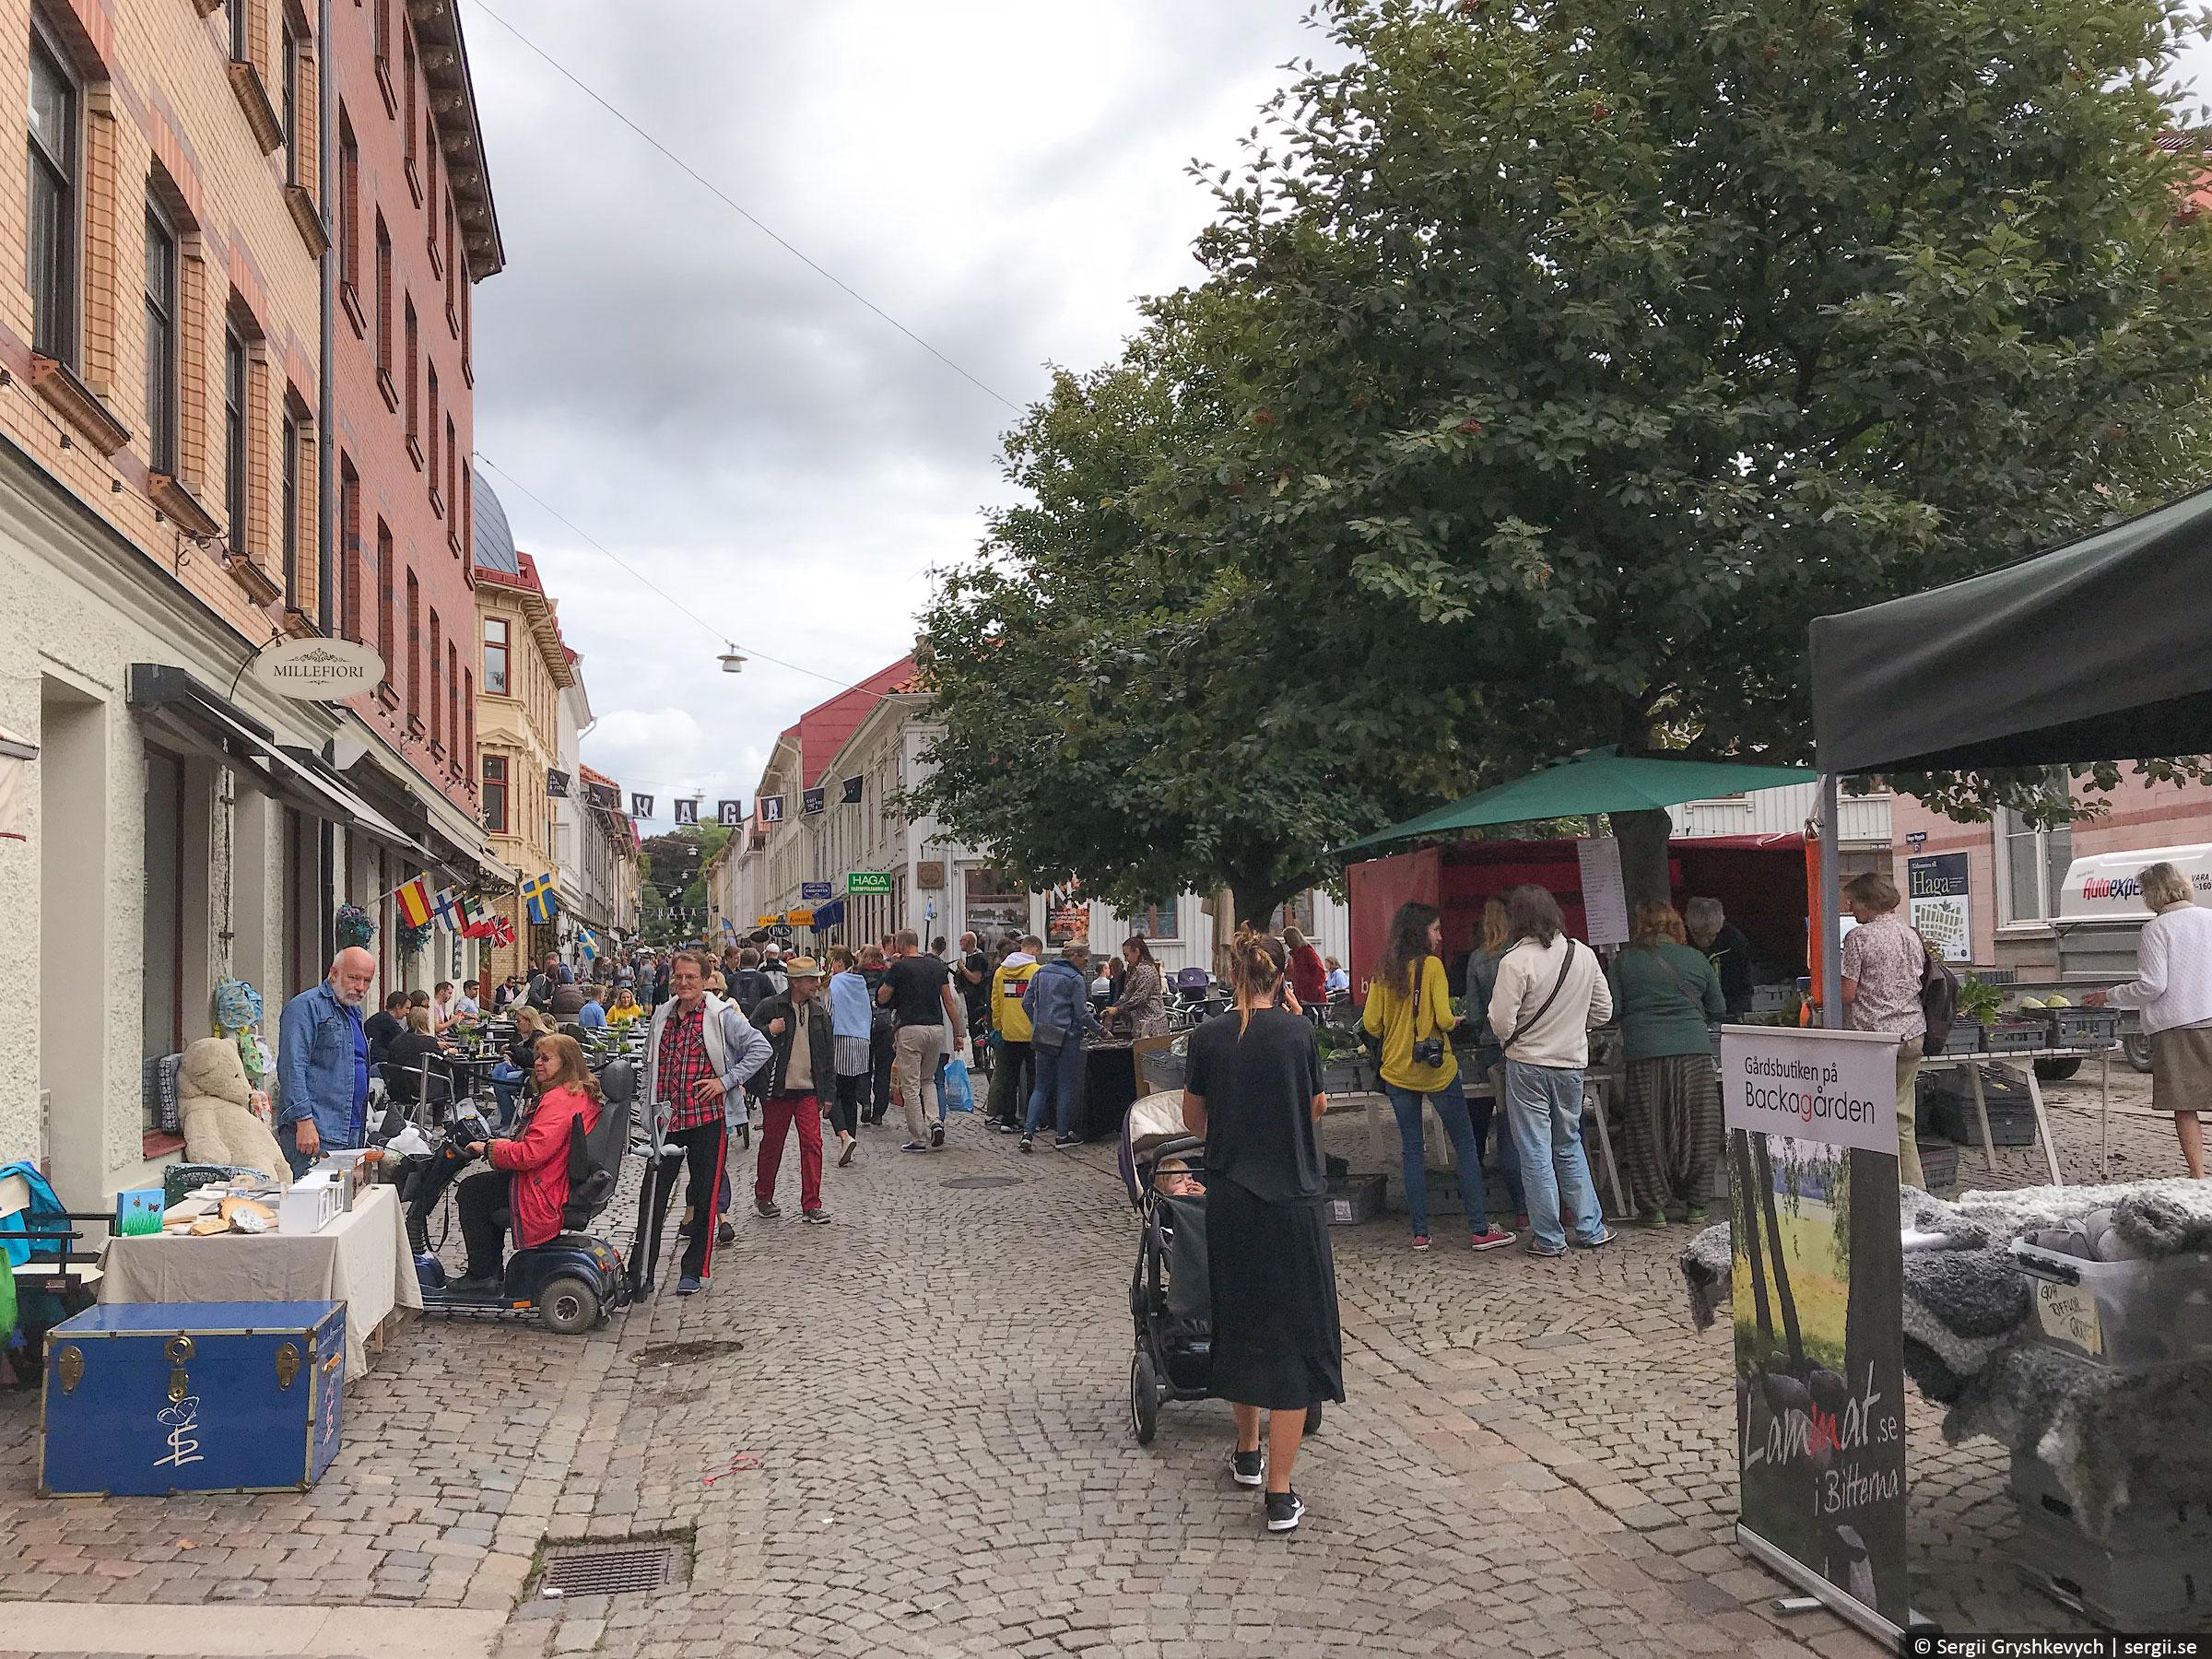 göteborg-ghotenburg-sweden-2018-44